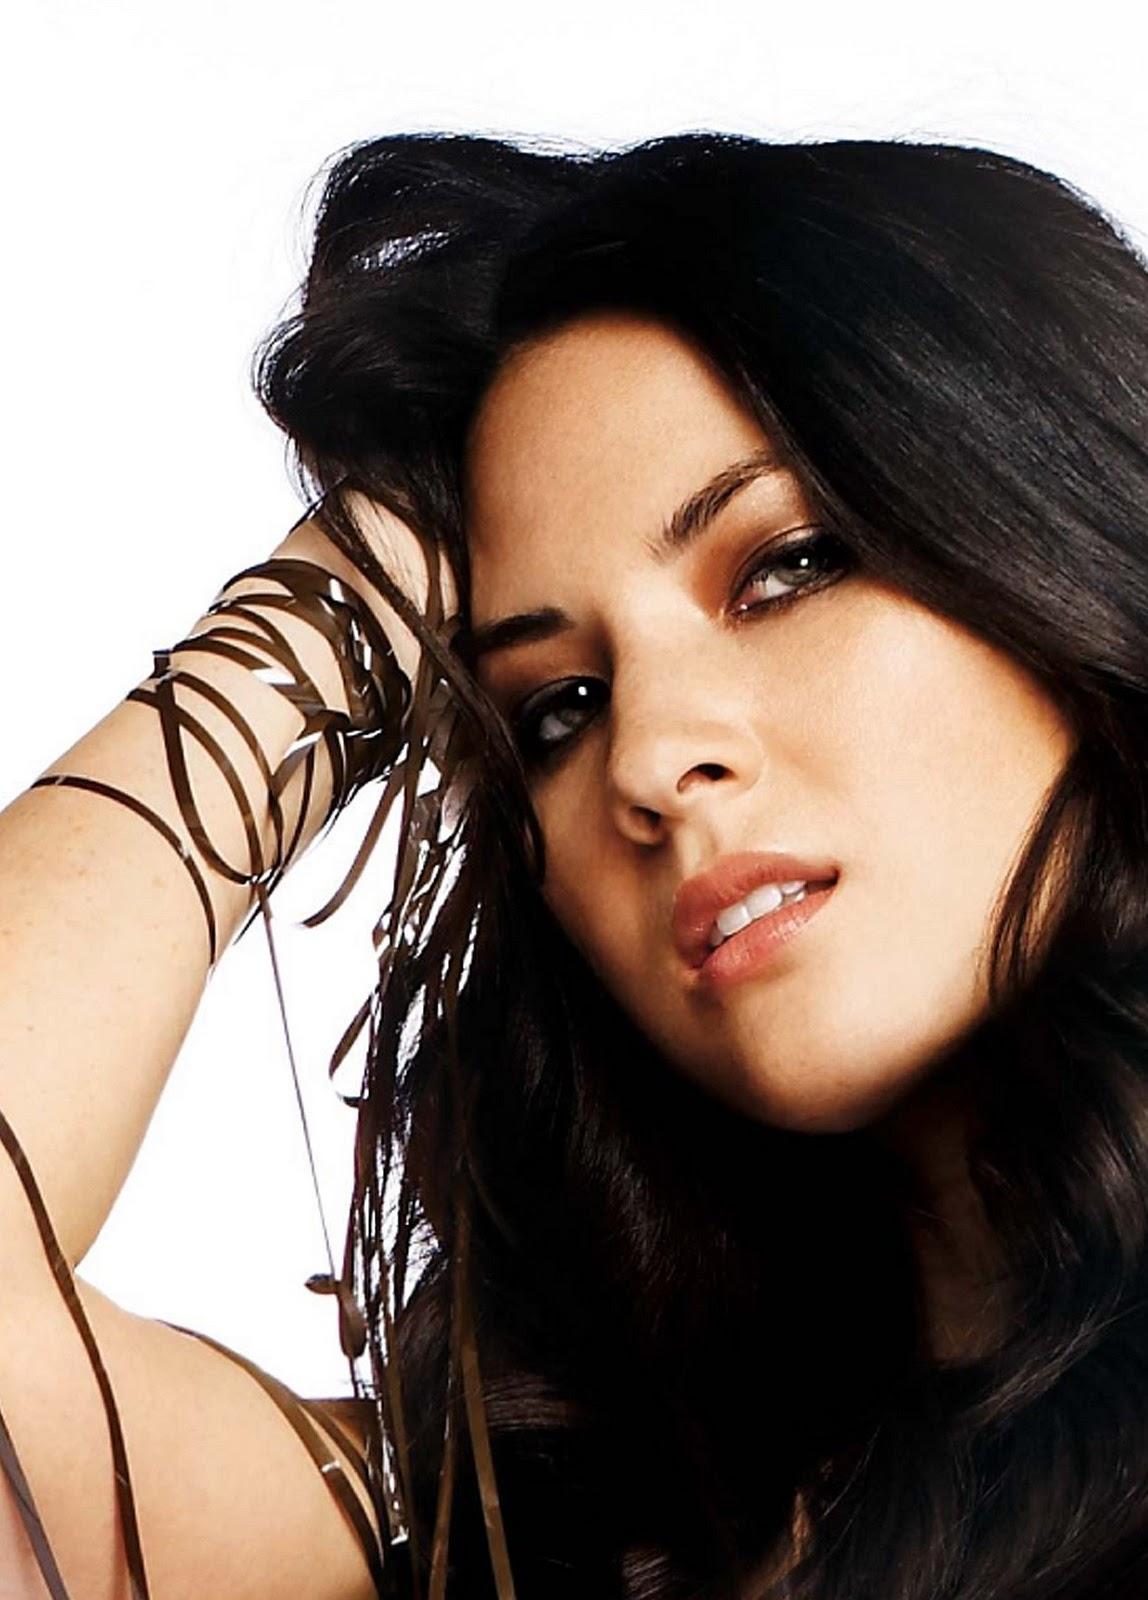 Top model bugil: Mila Kunis .. Hot Sexy Hmmmm.